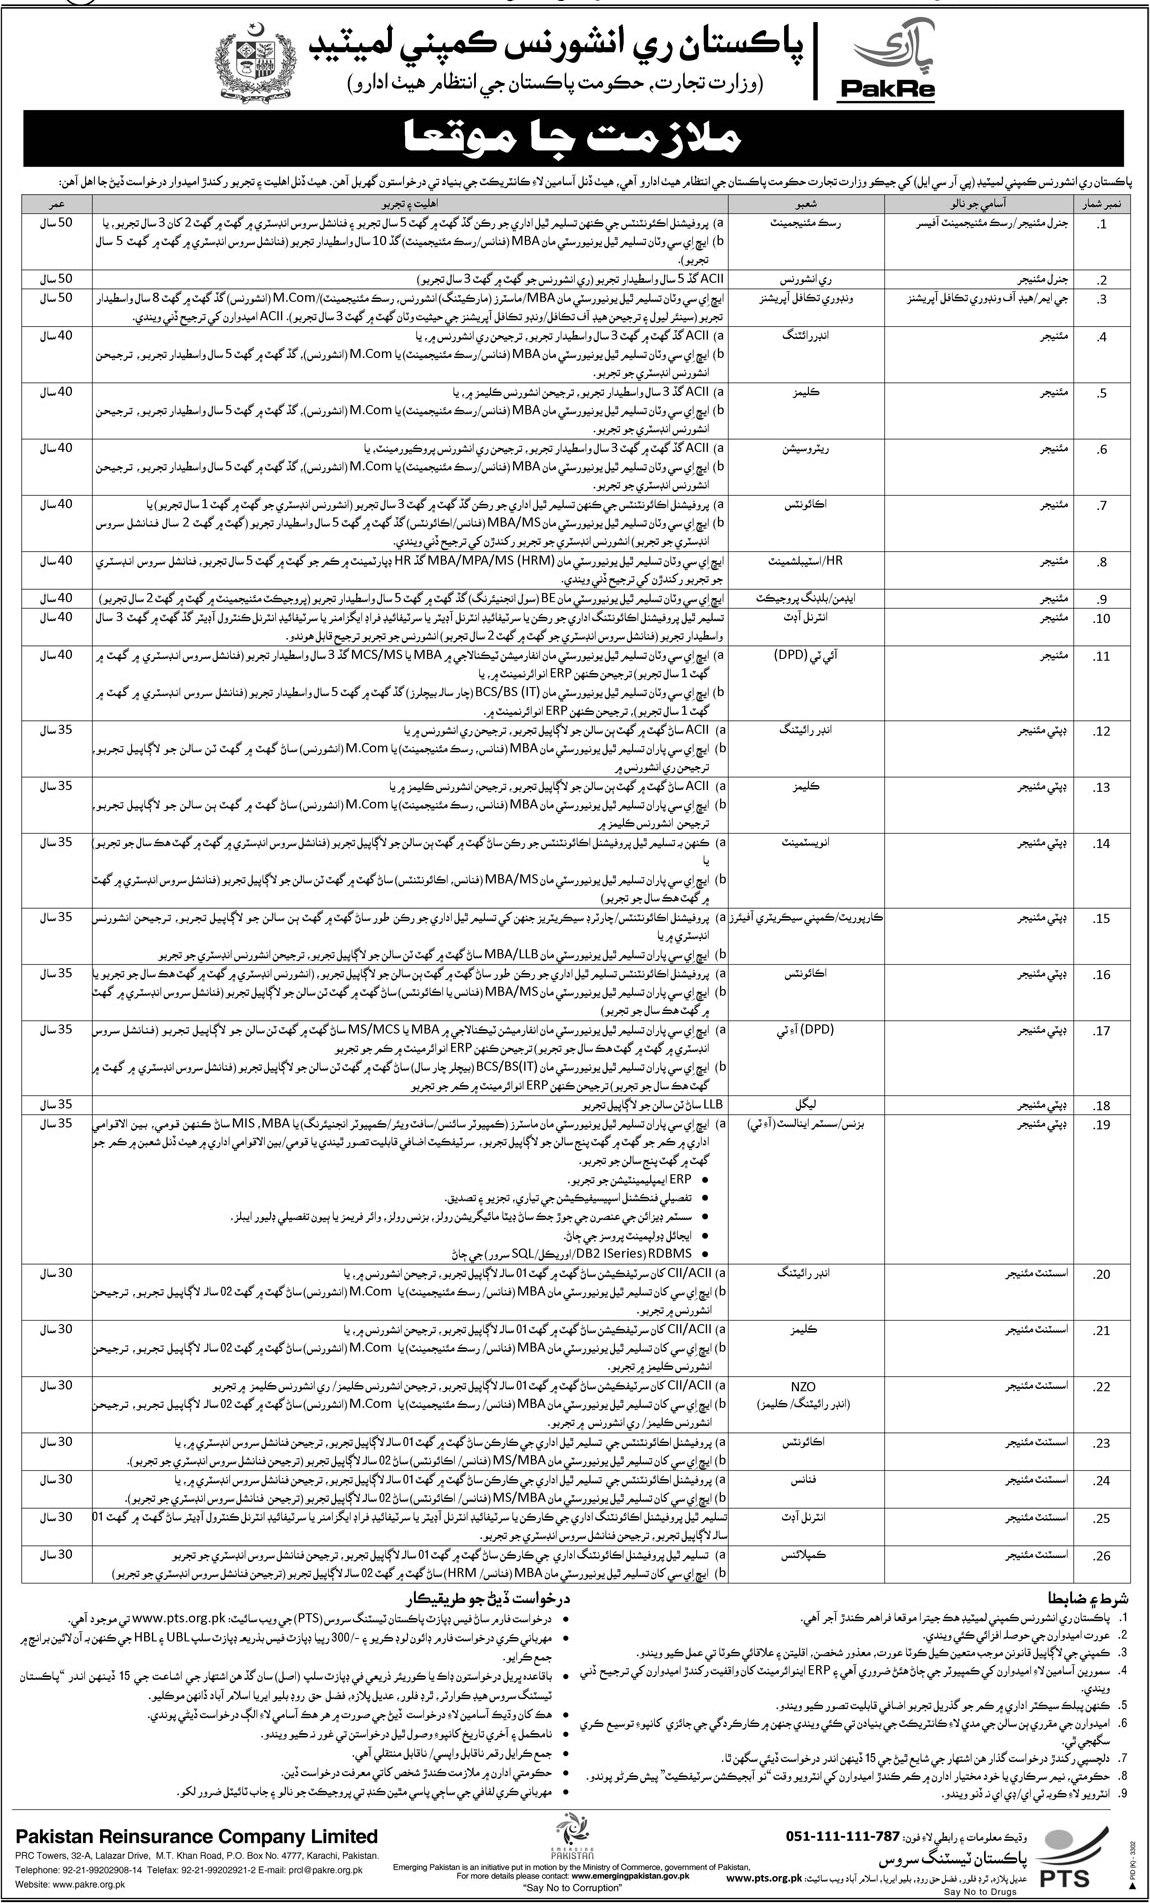 Pakistan Reinsurance Company Limited PRCL Jobs via PTS